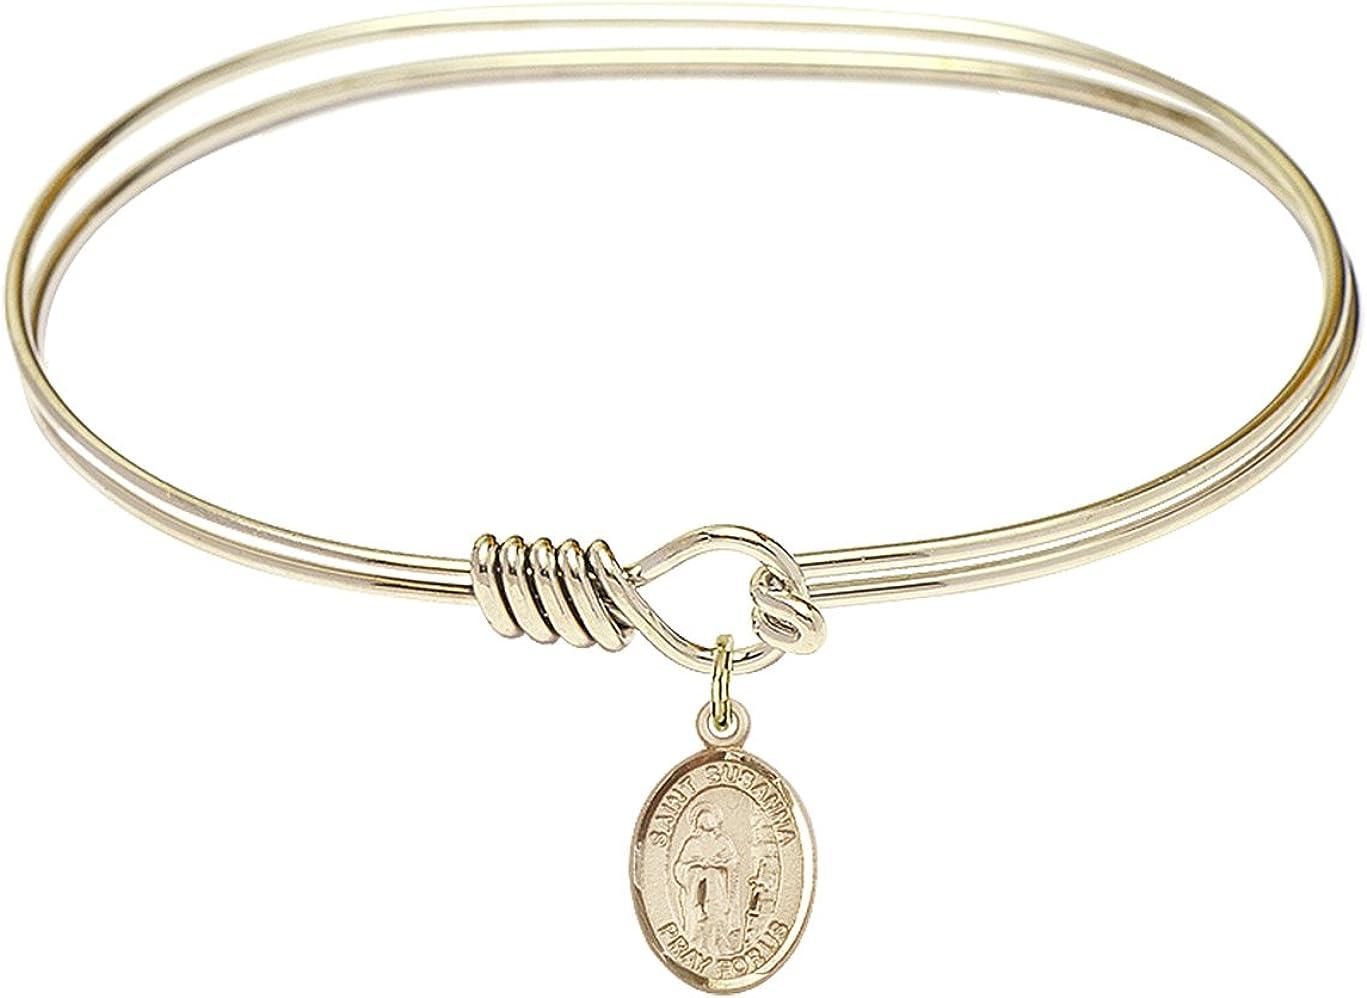 DiamondJewelryNY Eye Hook Bangle Bracelet with a St. Susanna Charm.